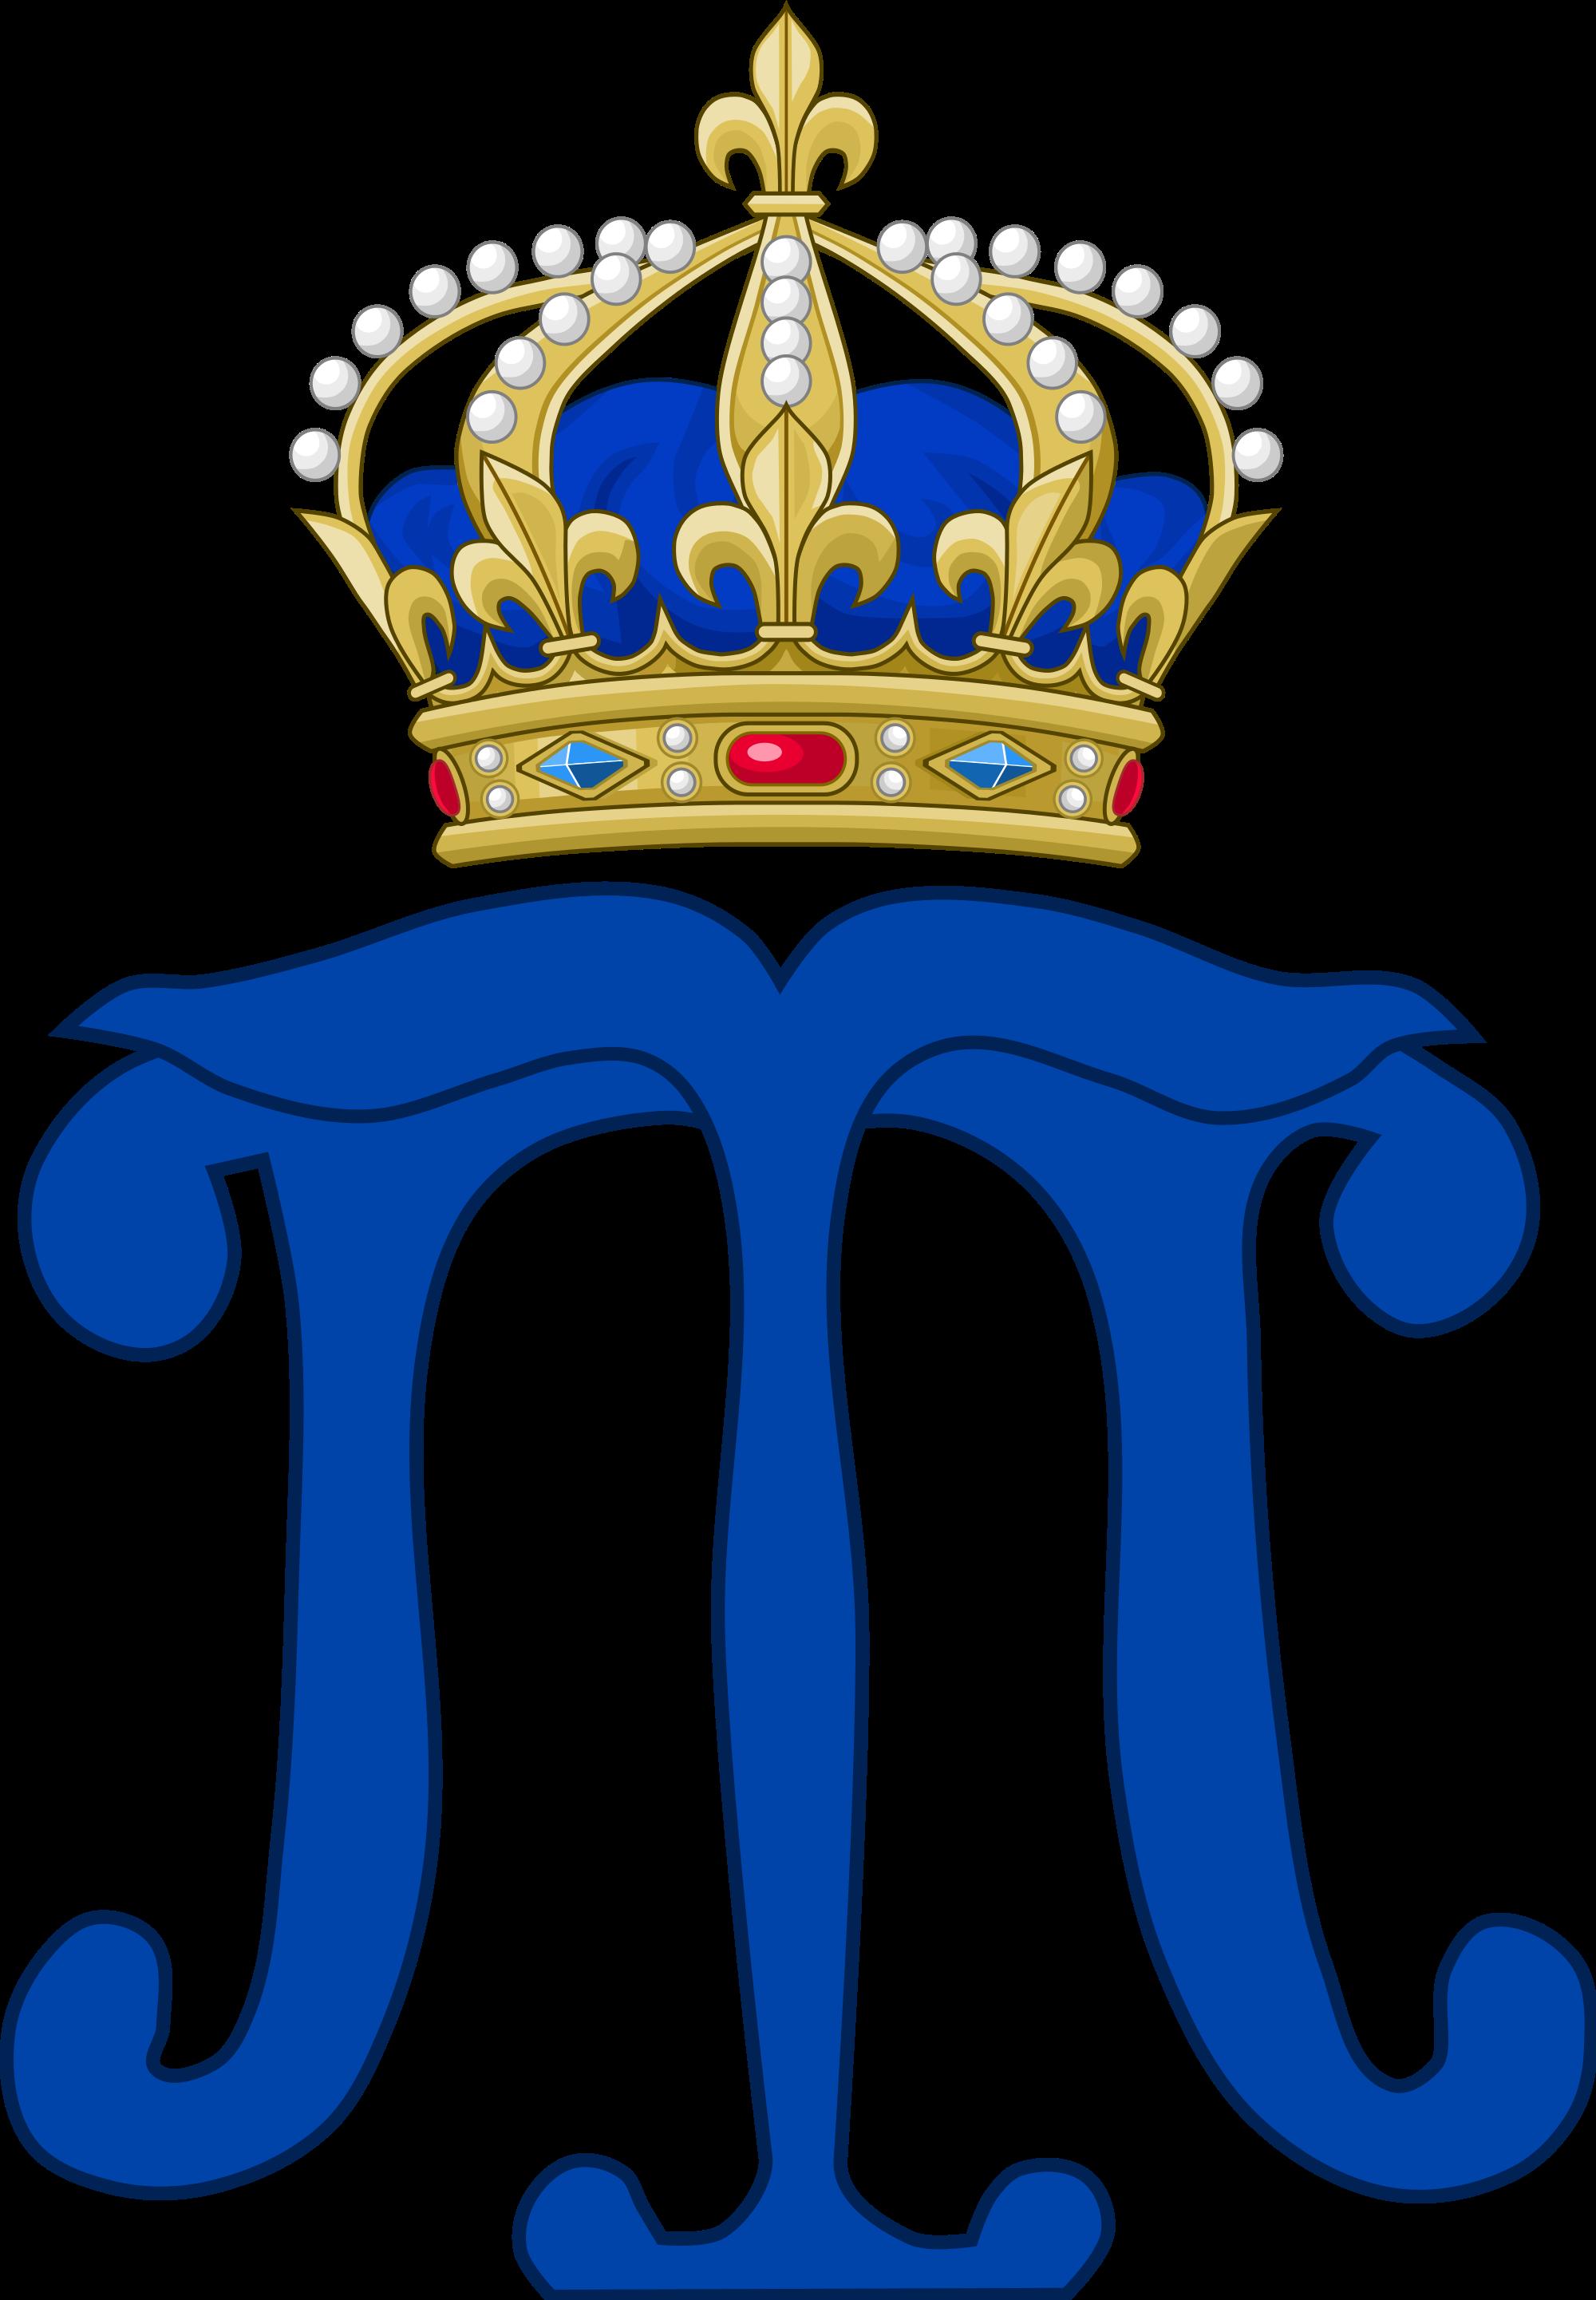 Crown monogram clipart svg transparent File:Royal Monogram of Marie Thérèse of Austria, Queen of France ... svg transparent